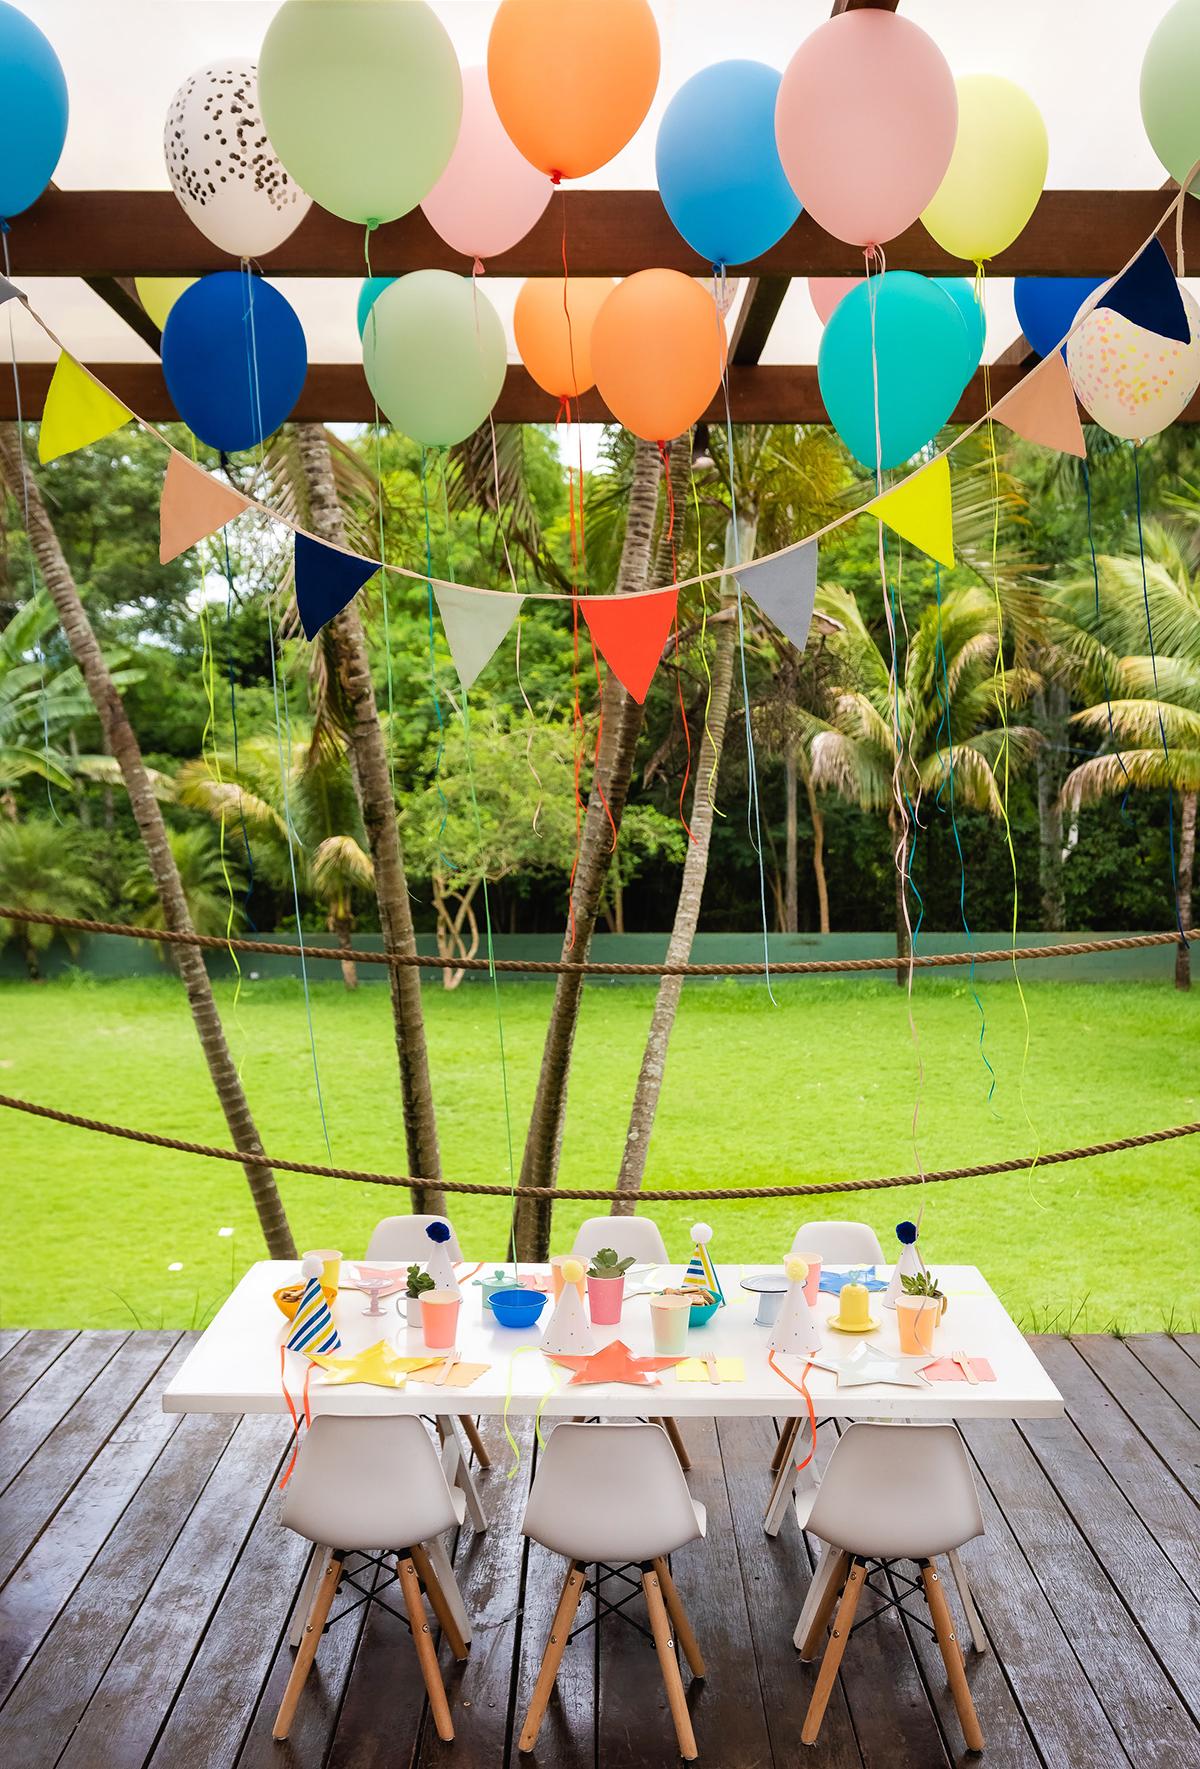 decoracao simples e barata festa aniversario infantil 1 ano colorida temas criativos masculinos menino teatro marionetes musica blog do math